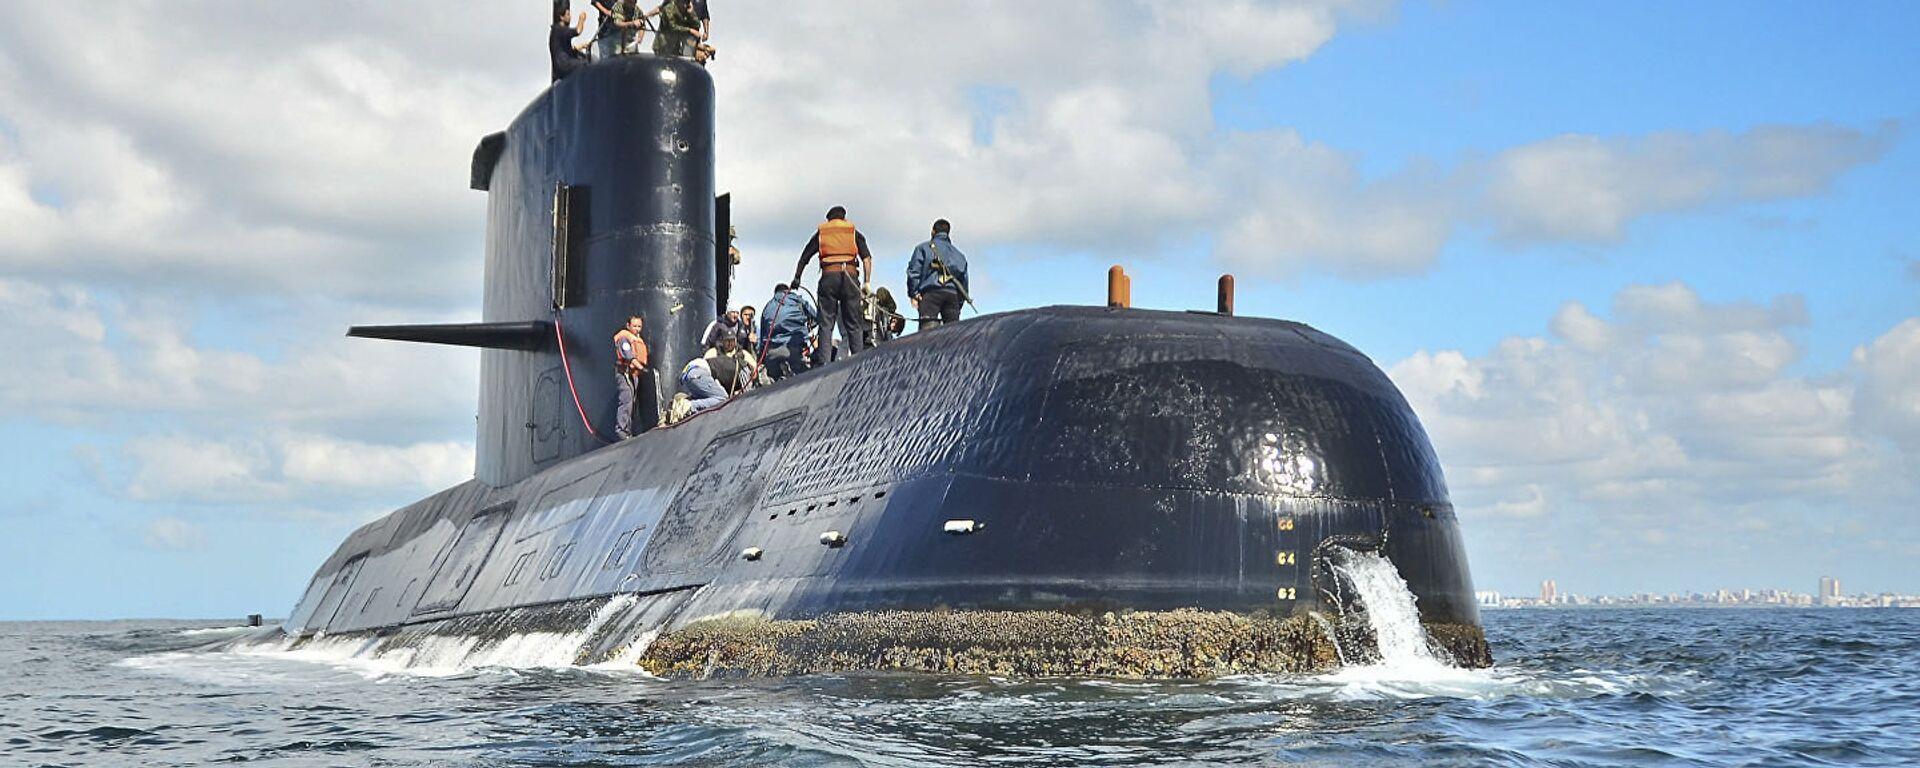 El submarino argentino ARA San Juan (archivo) - Sputnik Mundo, 1920, 25.02.2021